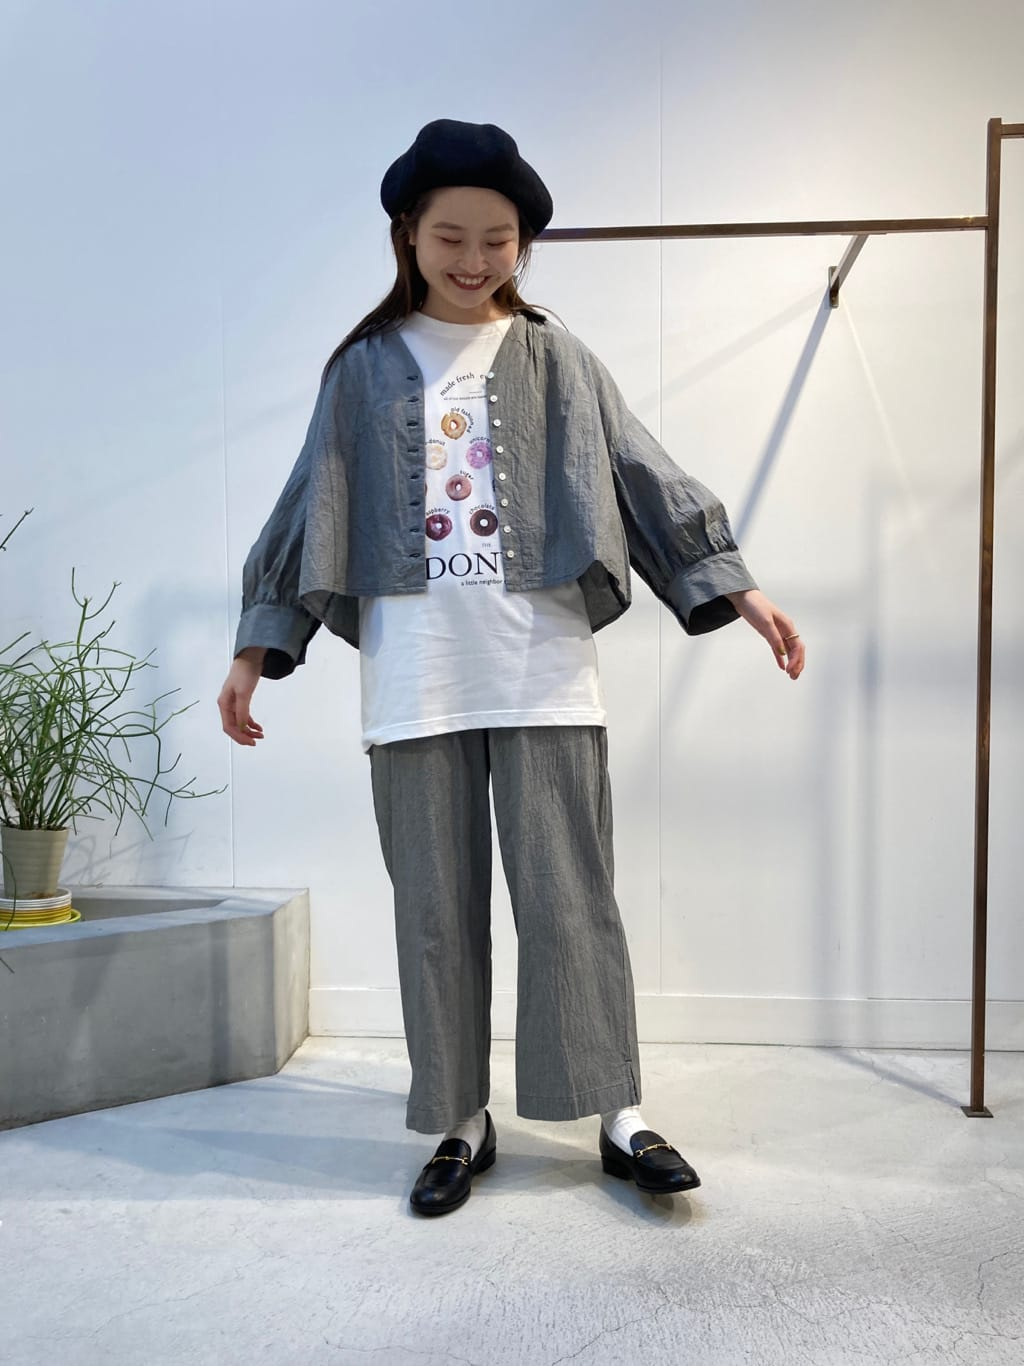 l'atelier du savon 名古屋栄路面 身長:159cm 2021.08.17